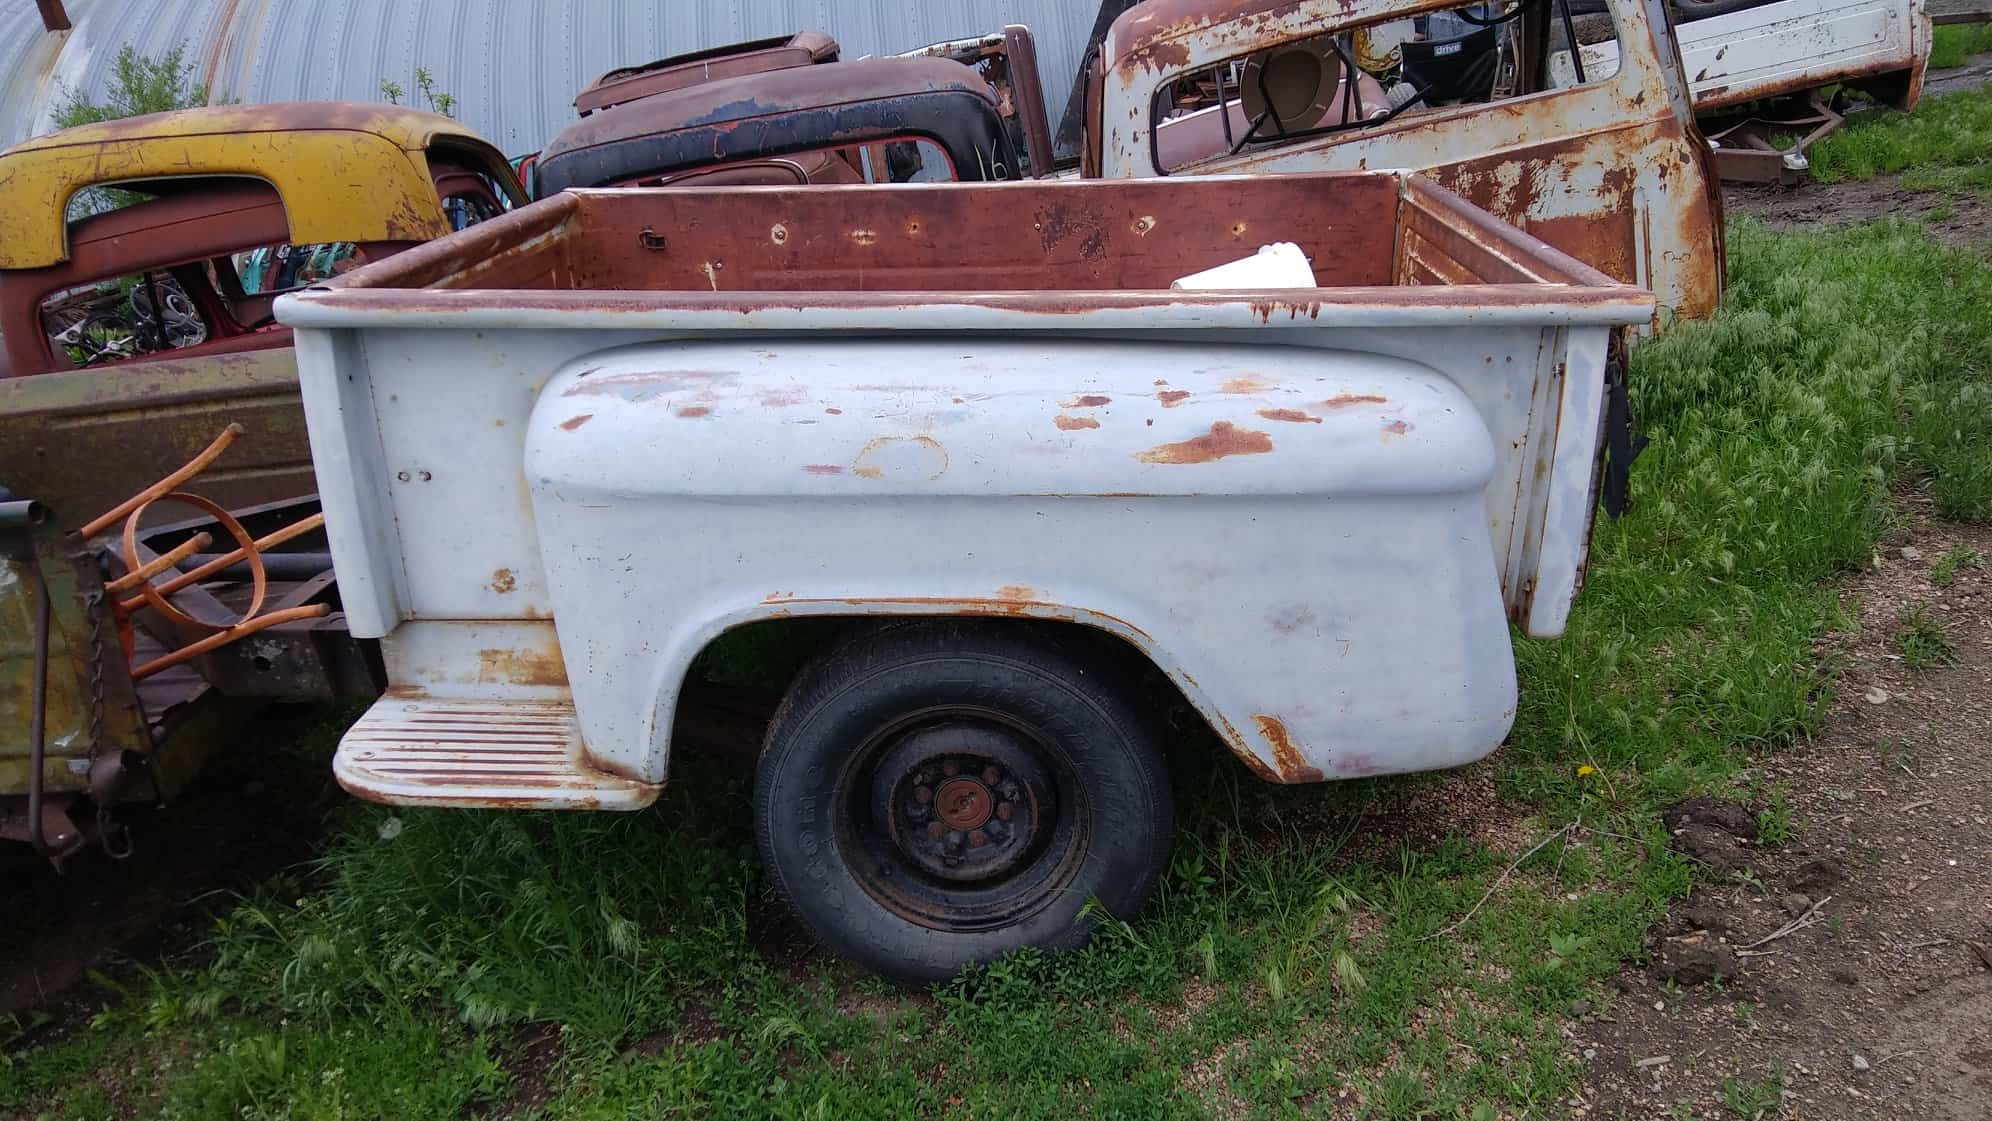 Classic Truck Beds For Sale in Harvard, Nebraska -11